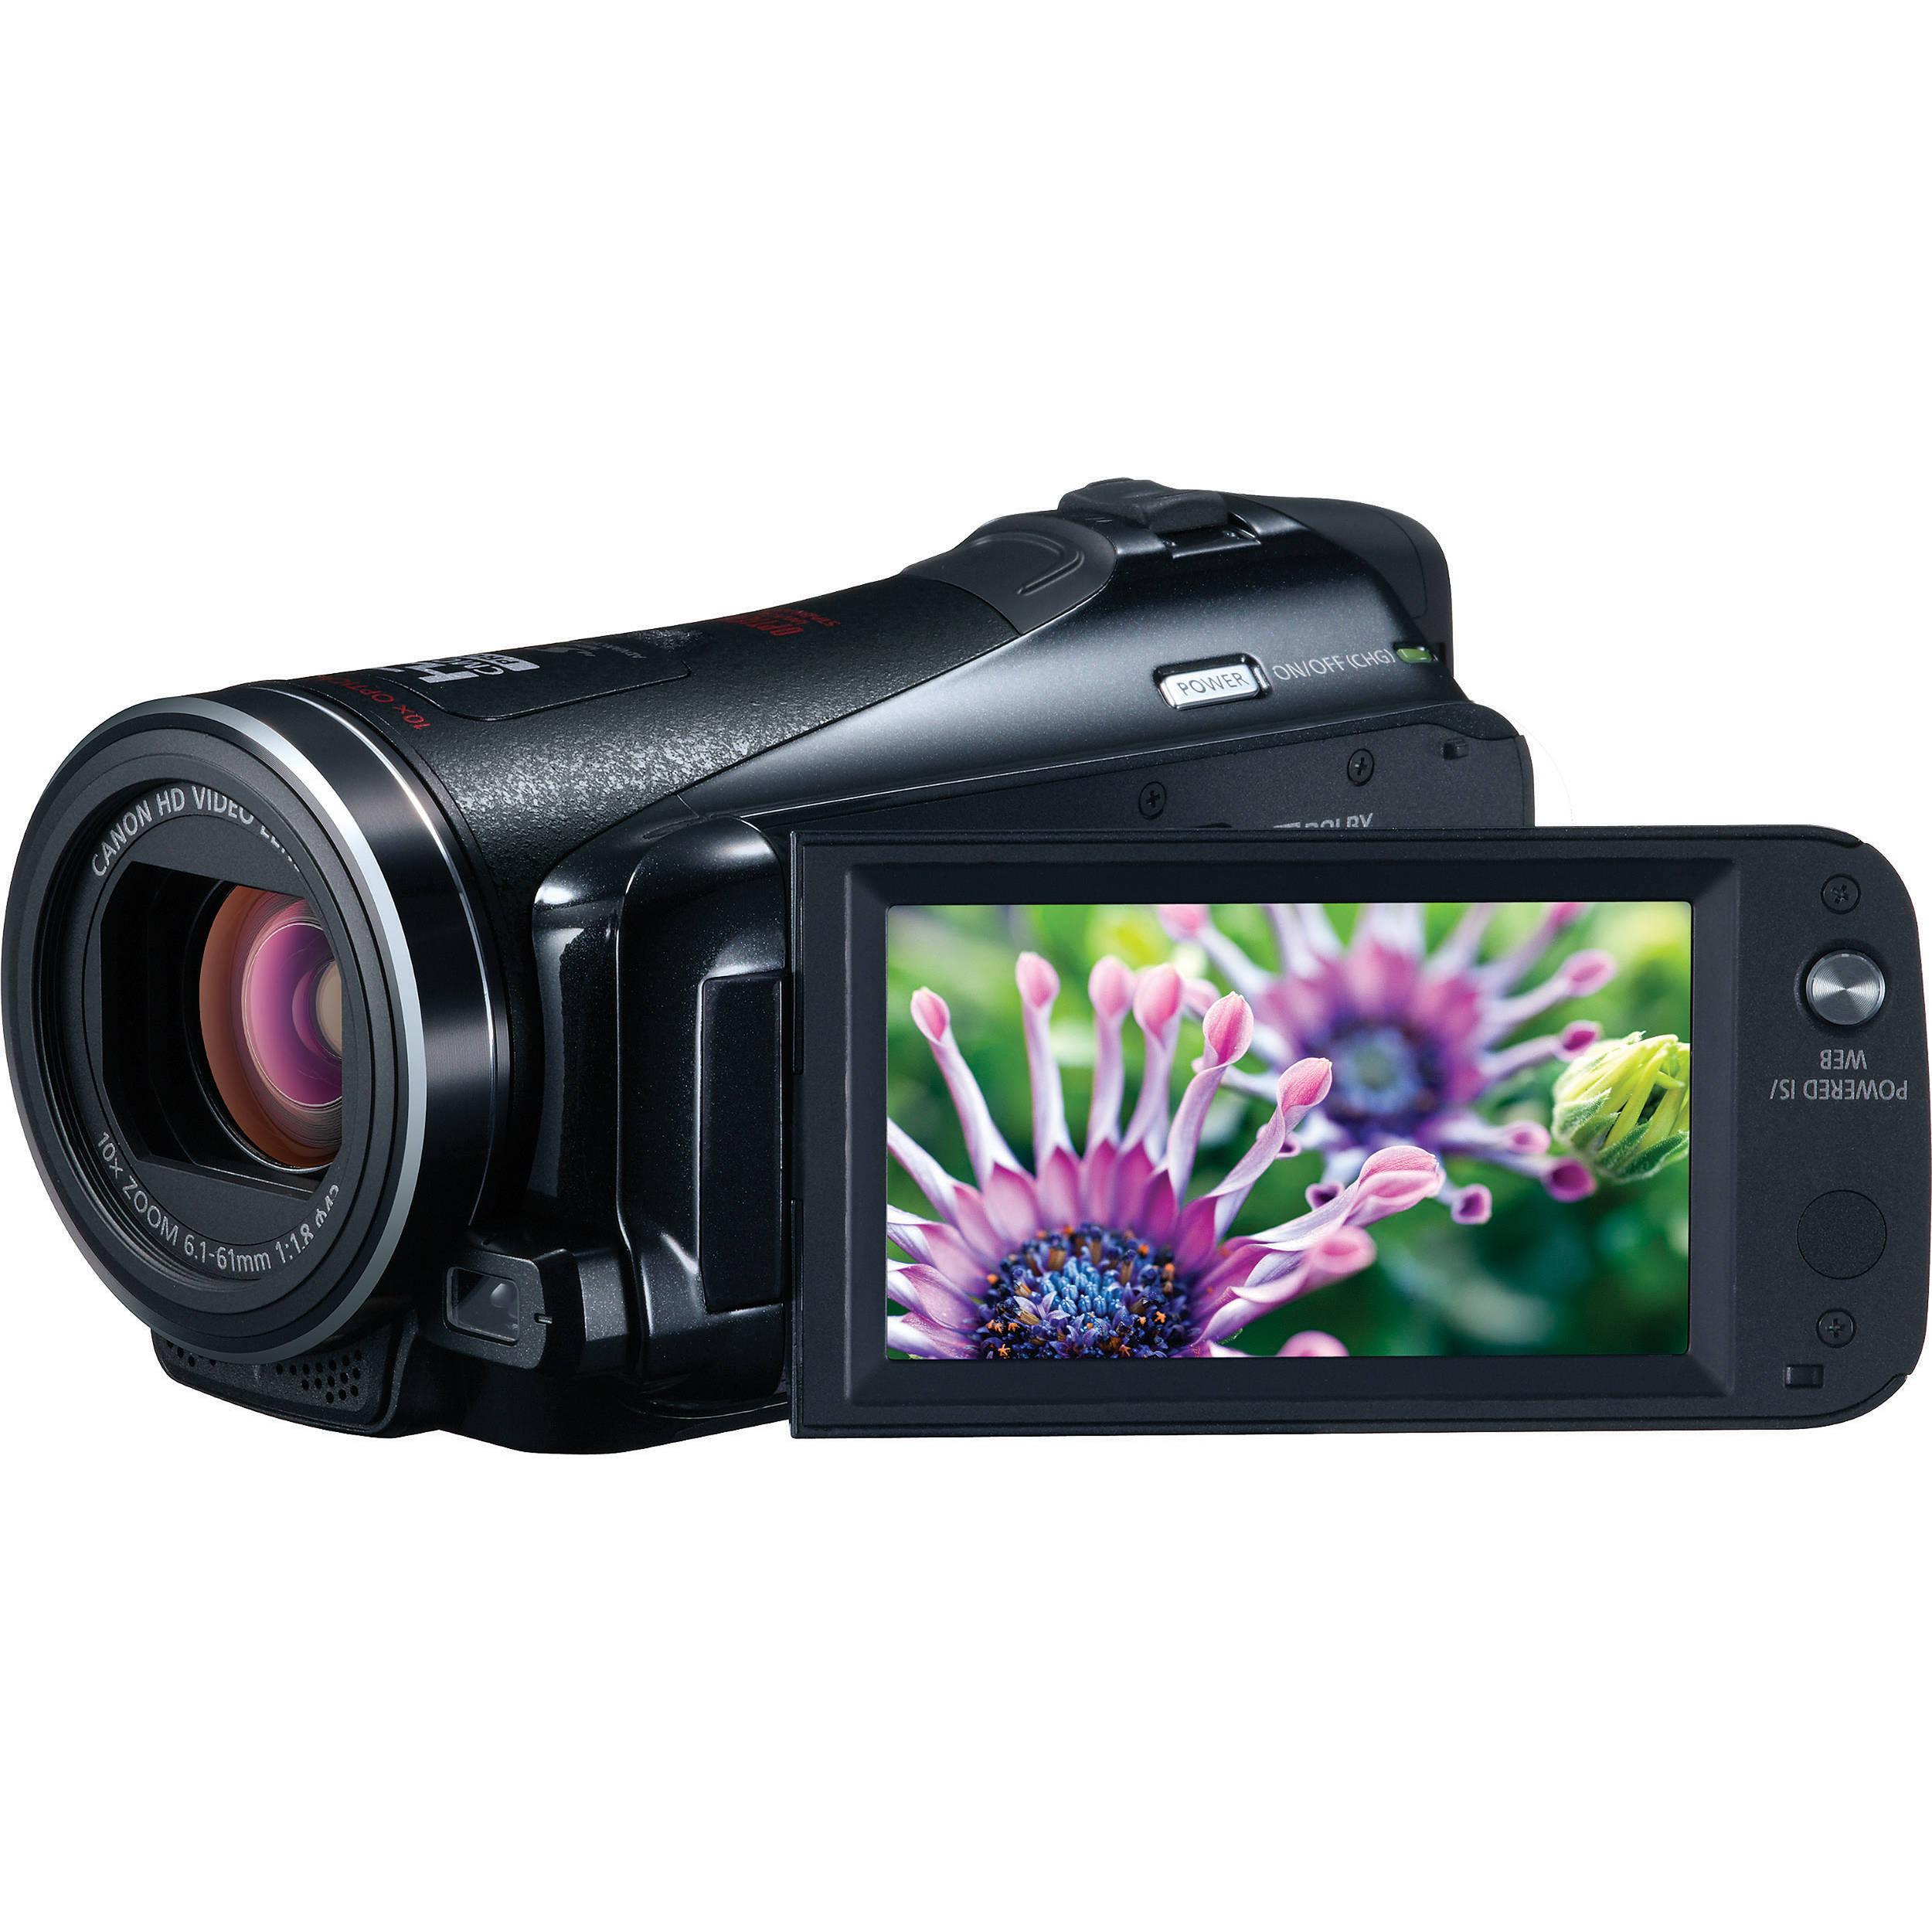 canon vixia hf m41 flash memory camcorder 5116b003 b h photo rh  bhphotovideo com canon vixia hfm41 manual pdf Canon Vixia HF10